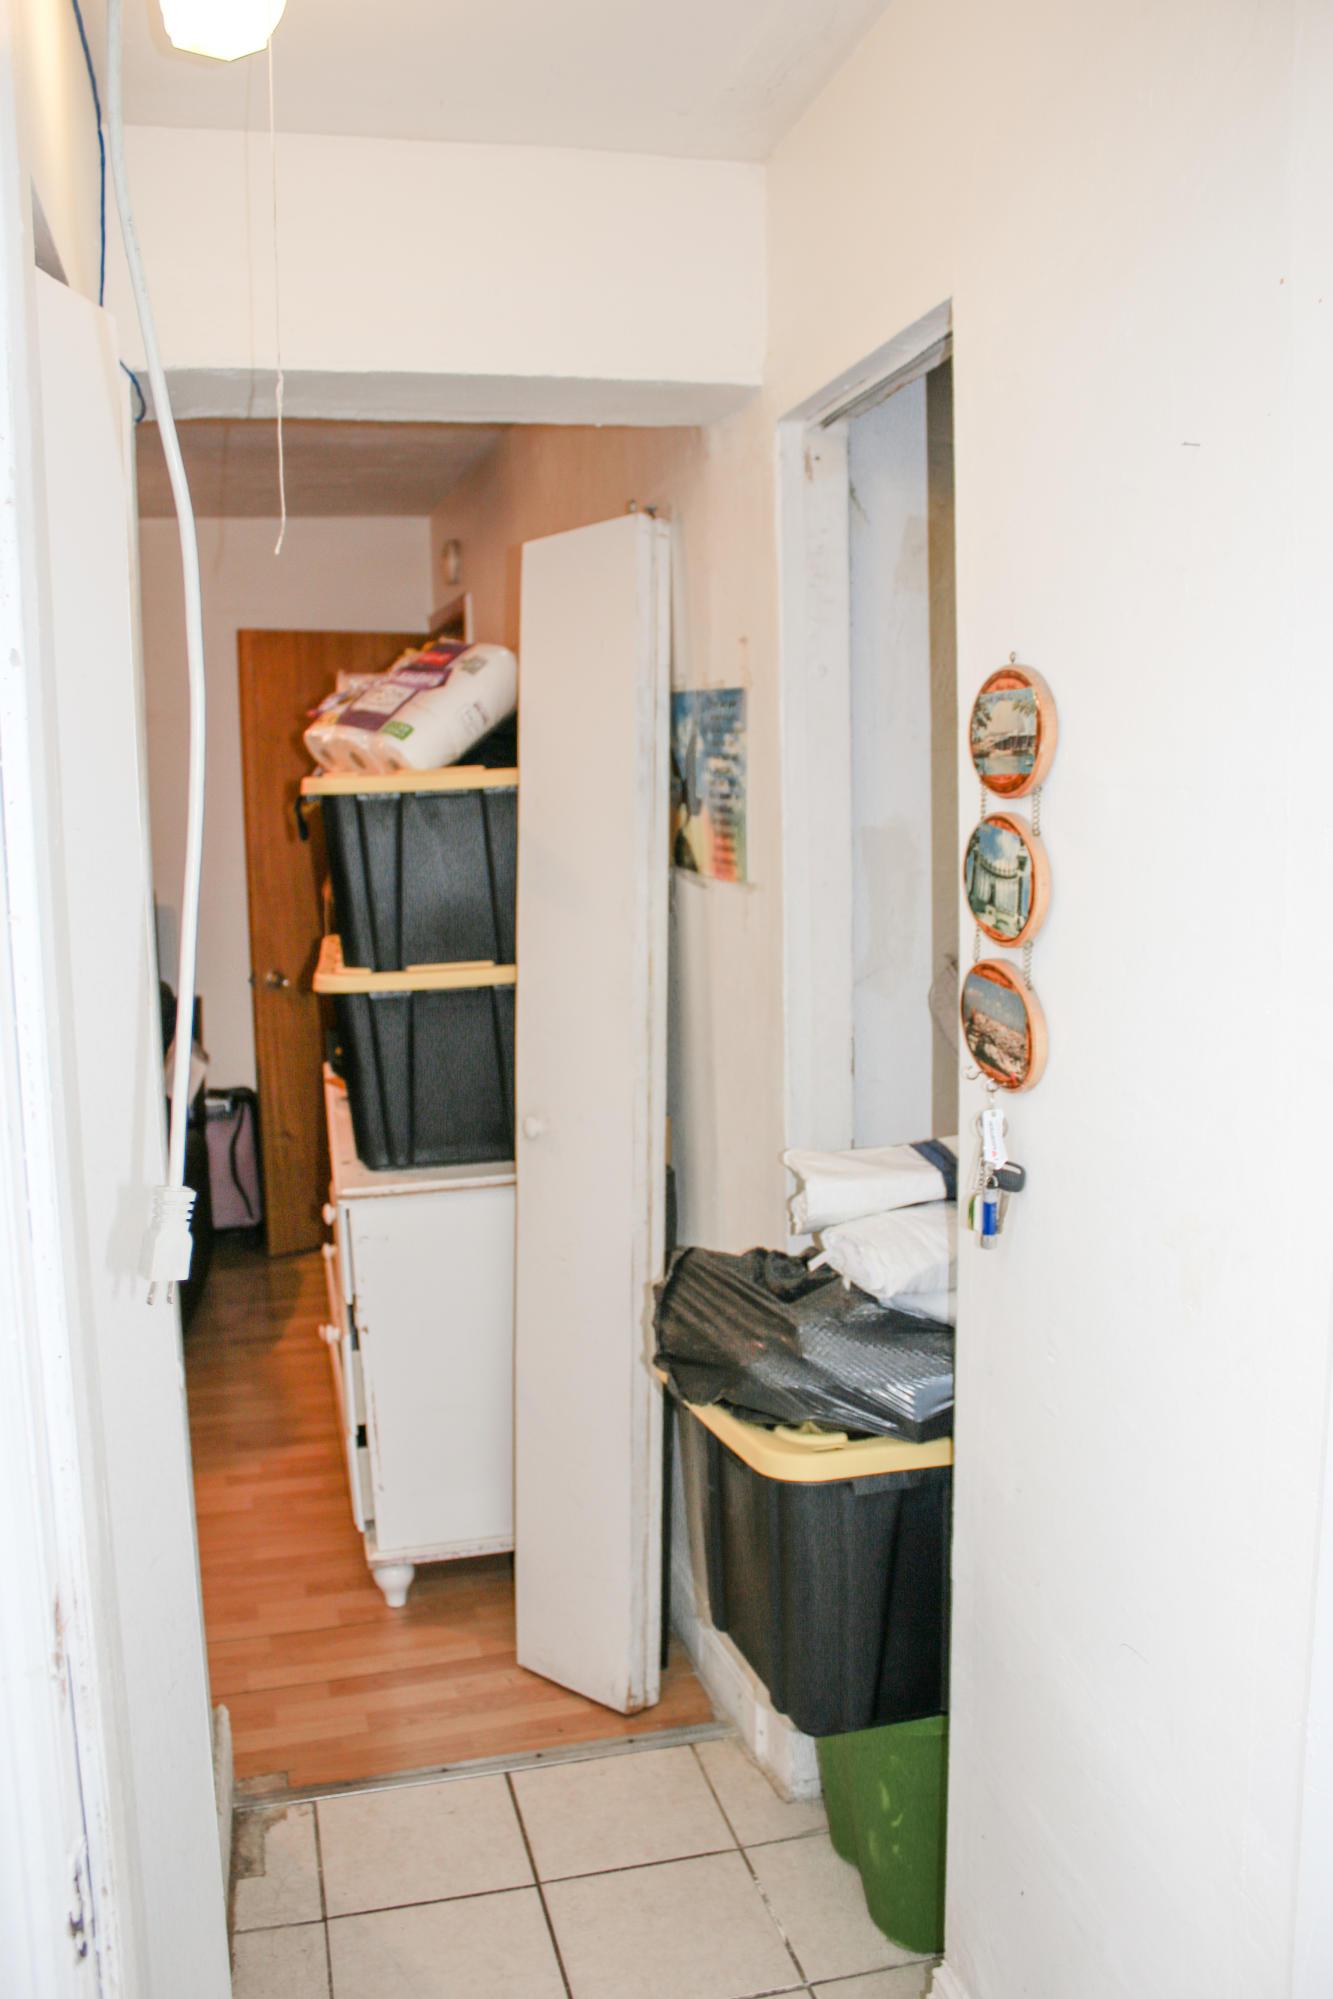 1/1 Apartment Hallway